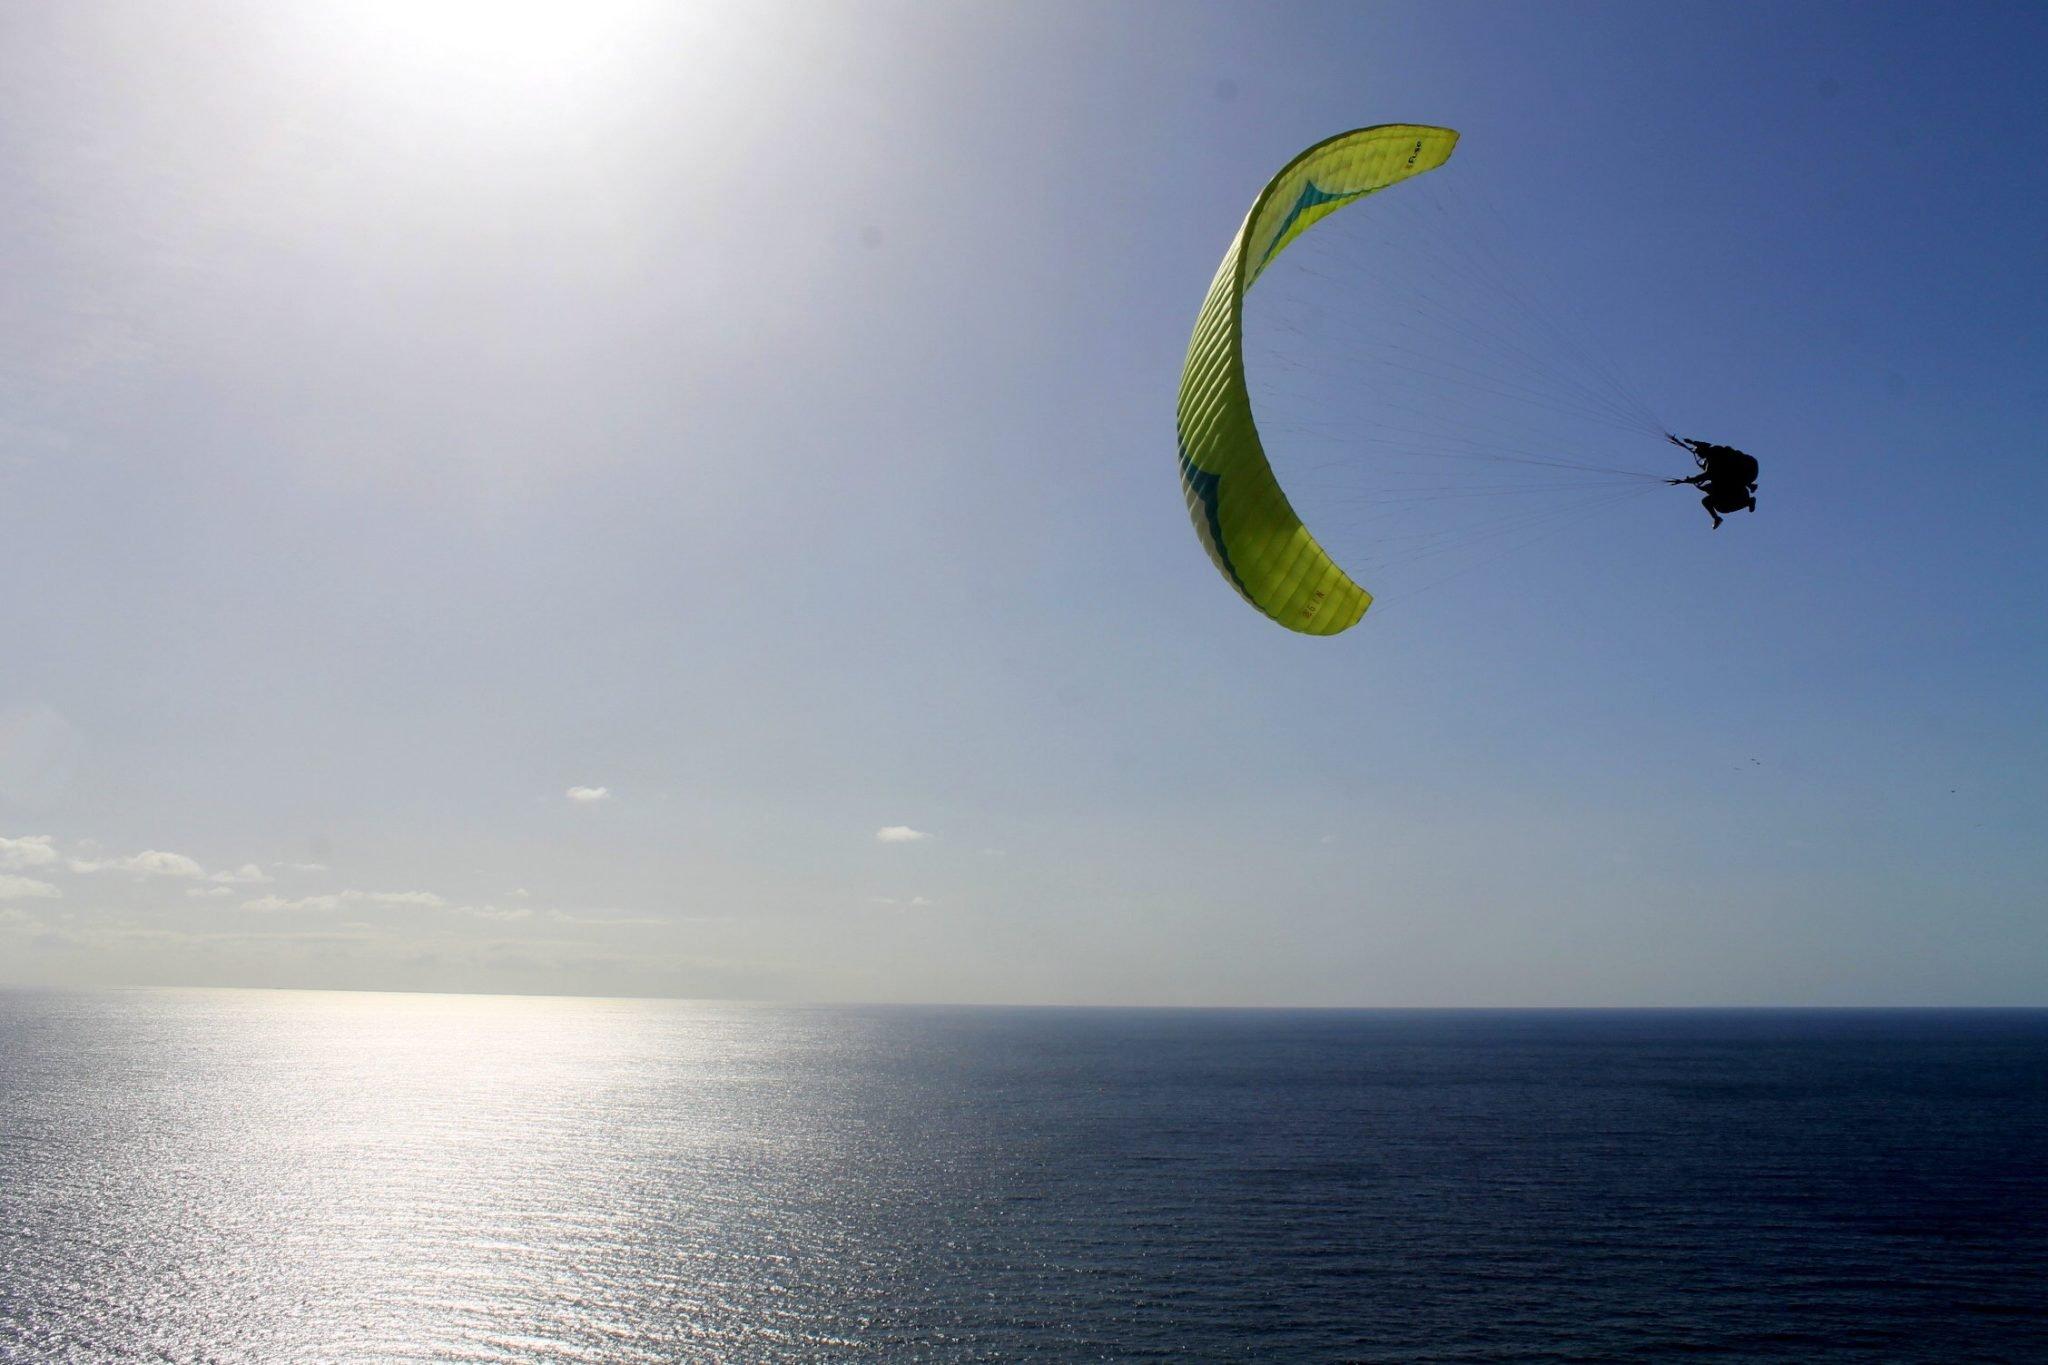 Torrey Pines Gliderport | Paragliding San Diego, California